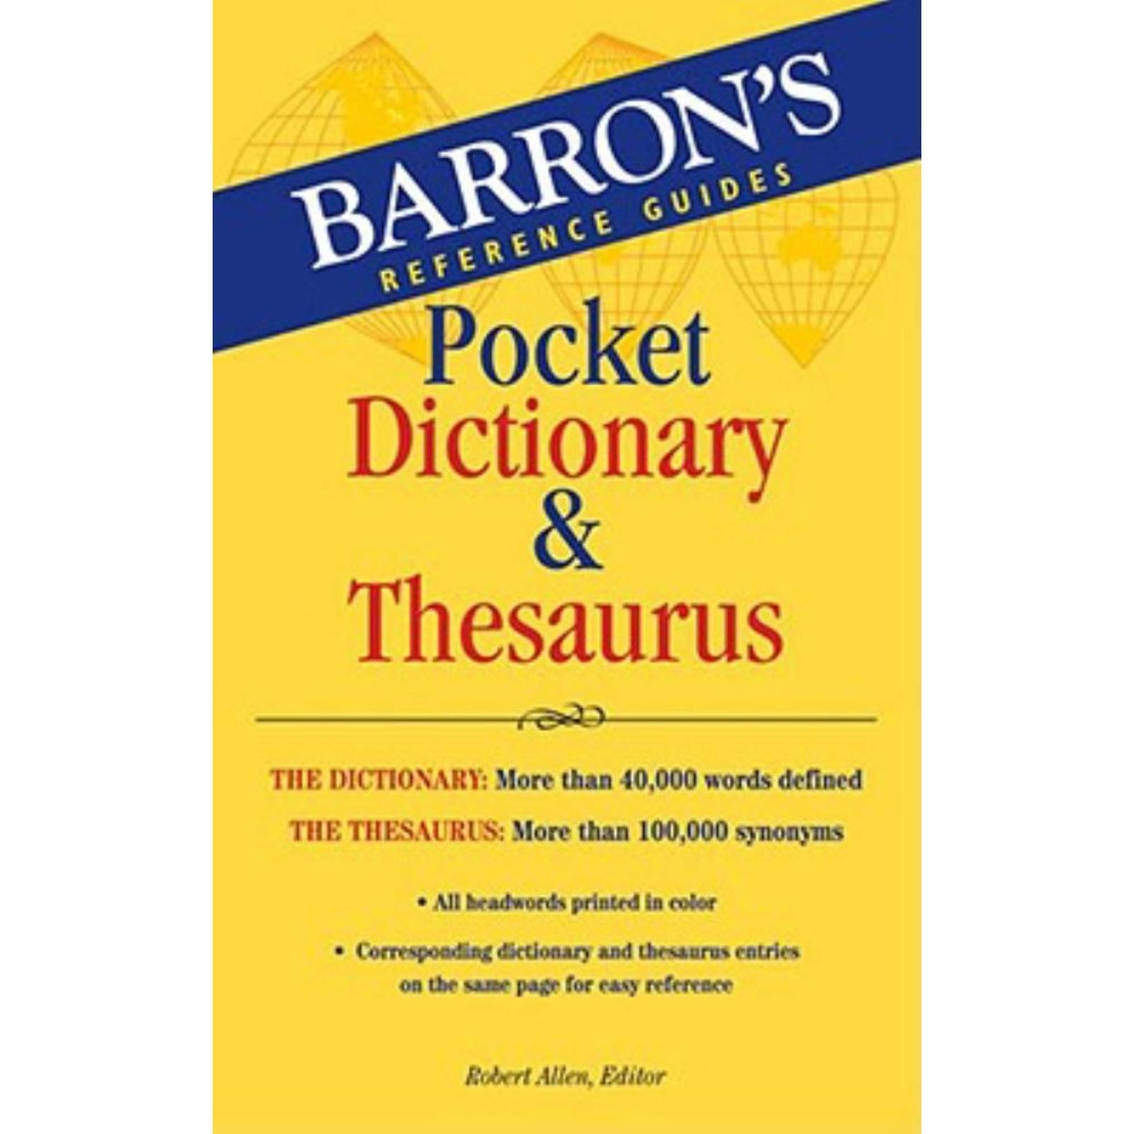 Barron S Pocket Dictionary And Thesaurus